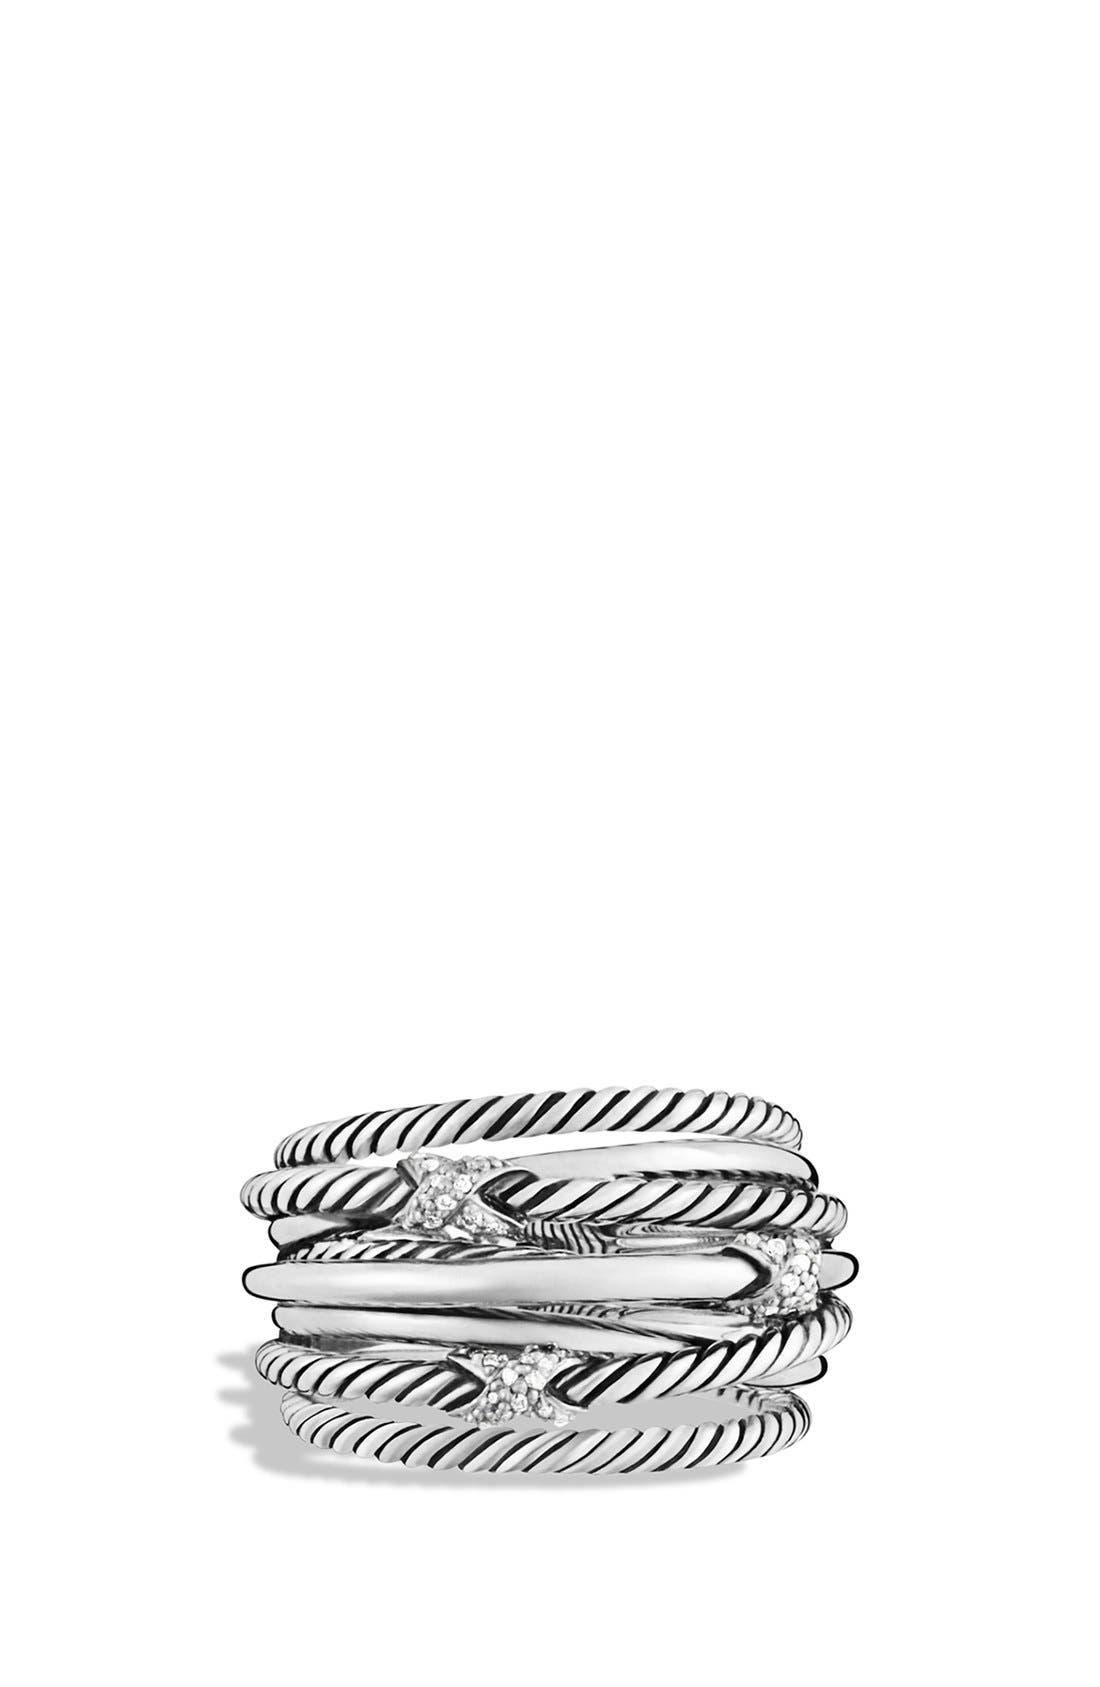 Alternate Image 3  - David Yurman 'Three X Crossover' Ring with Diamonds